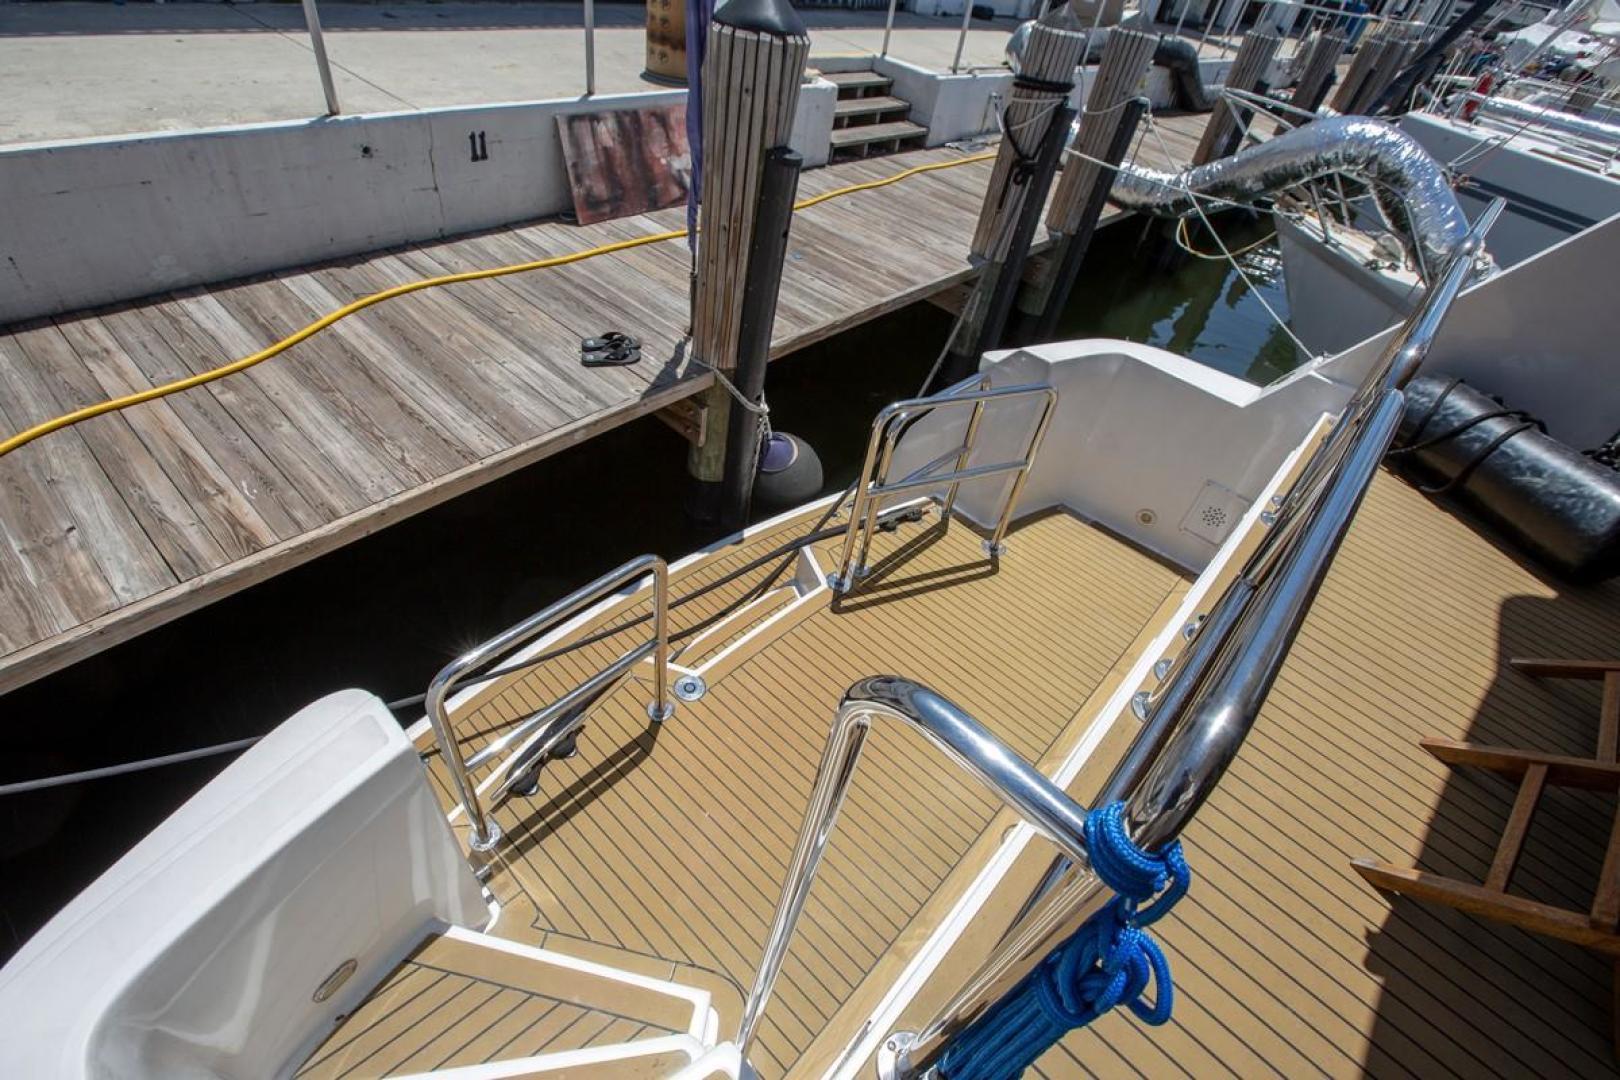 Hatteras-Cockpit Motor Yacht 2000-Getaway Ft. Lauderdale-Florida-United States-977408 | Thumbnail